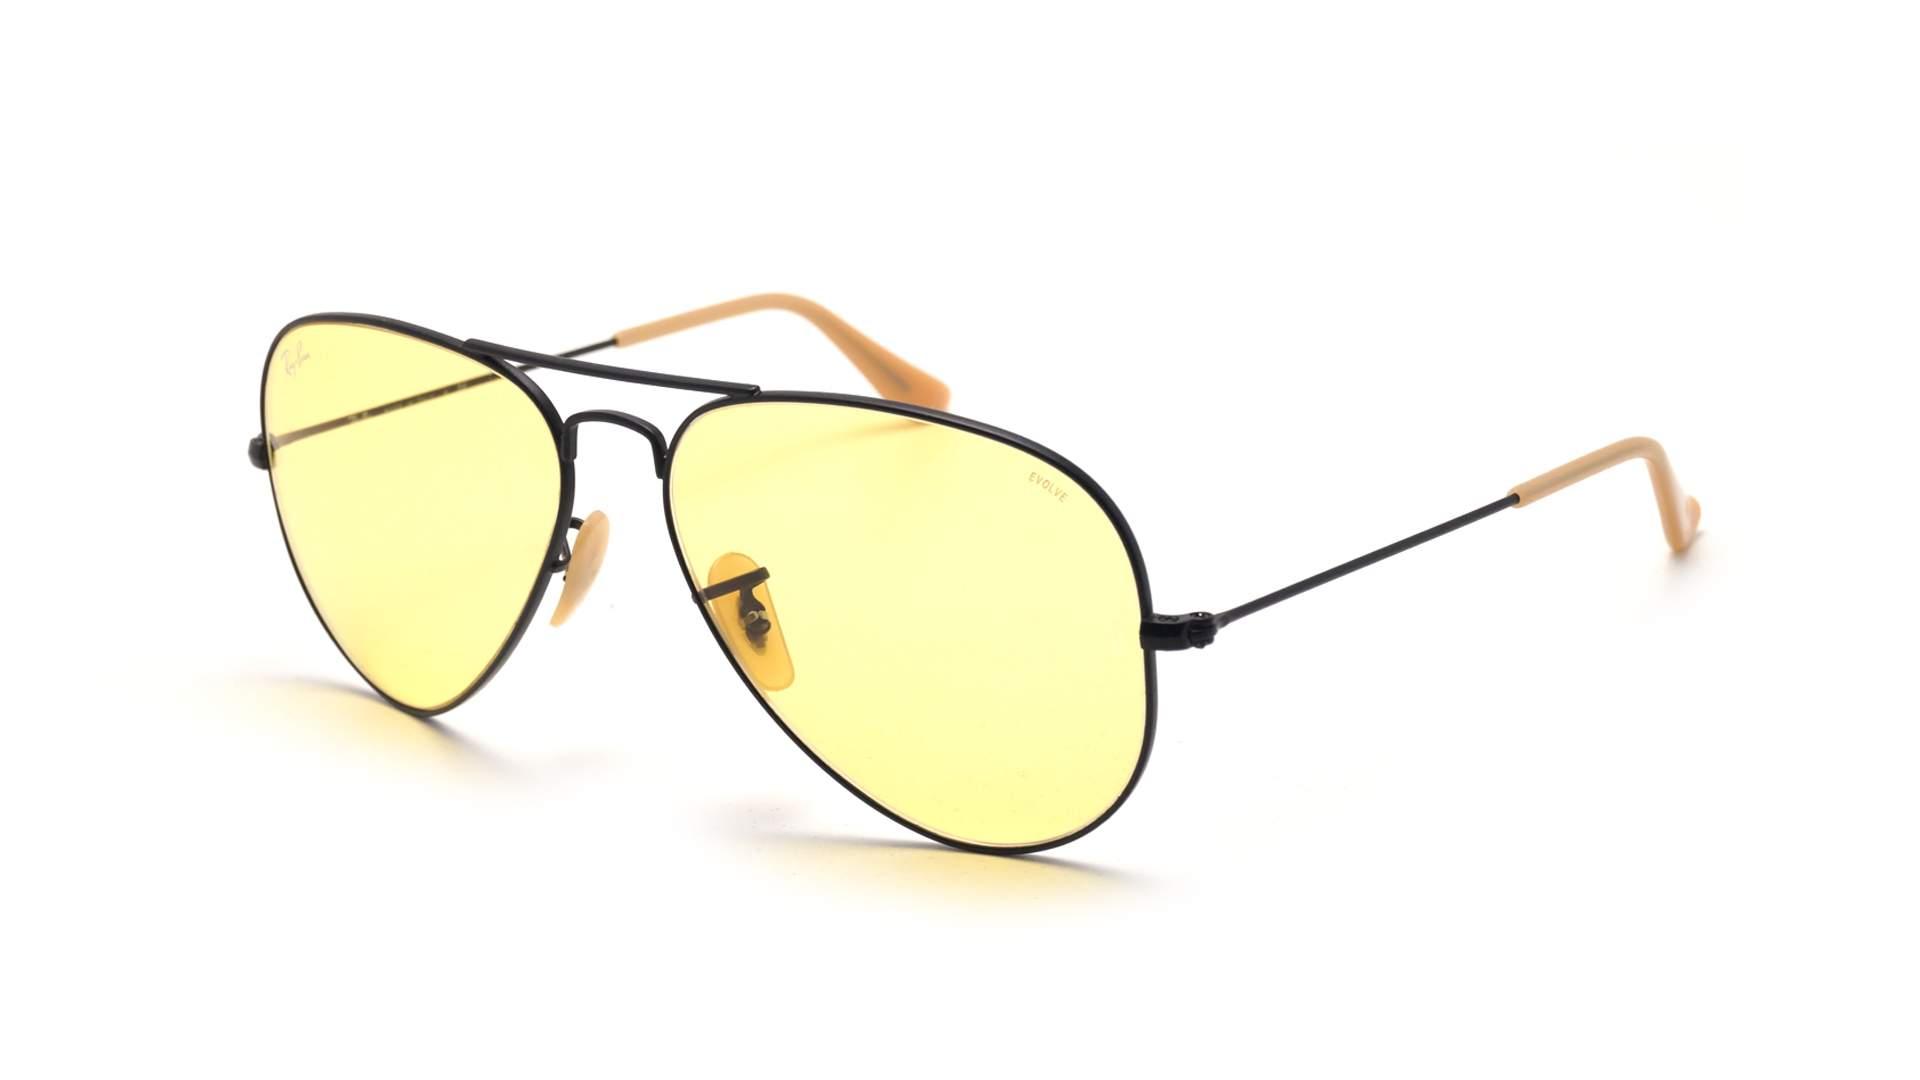 634453dae9 Sunglasses Ray-Ban Aviator Evolve Black Matte RB3025 9066 4A 58-14 Large  Polarized